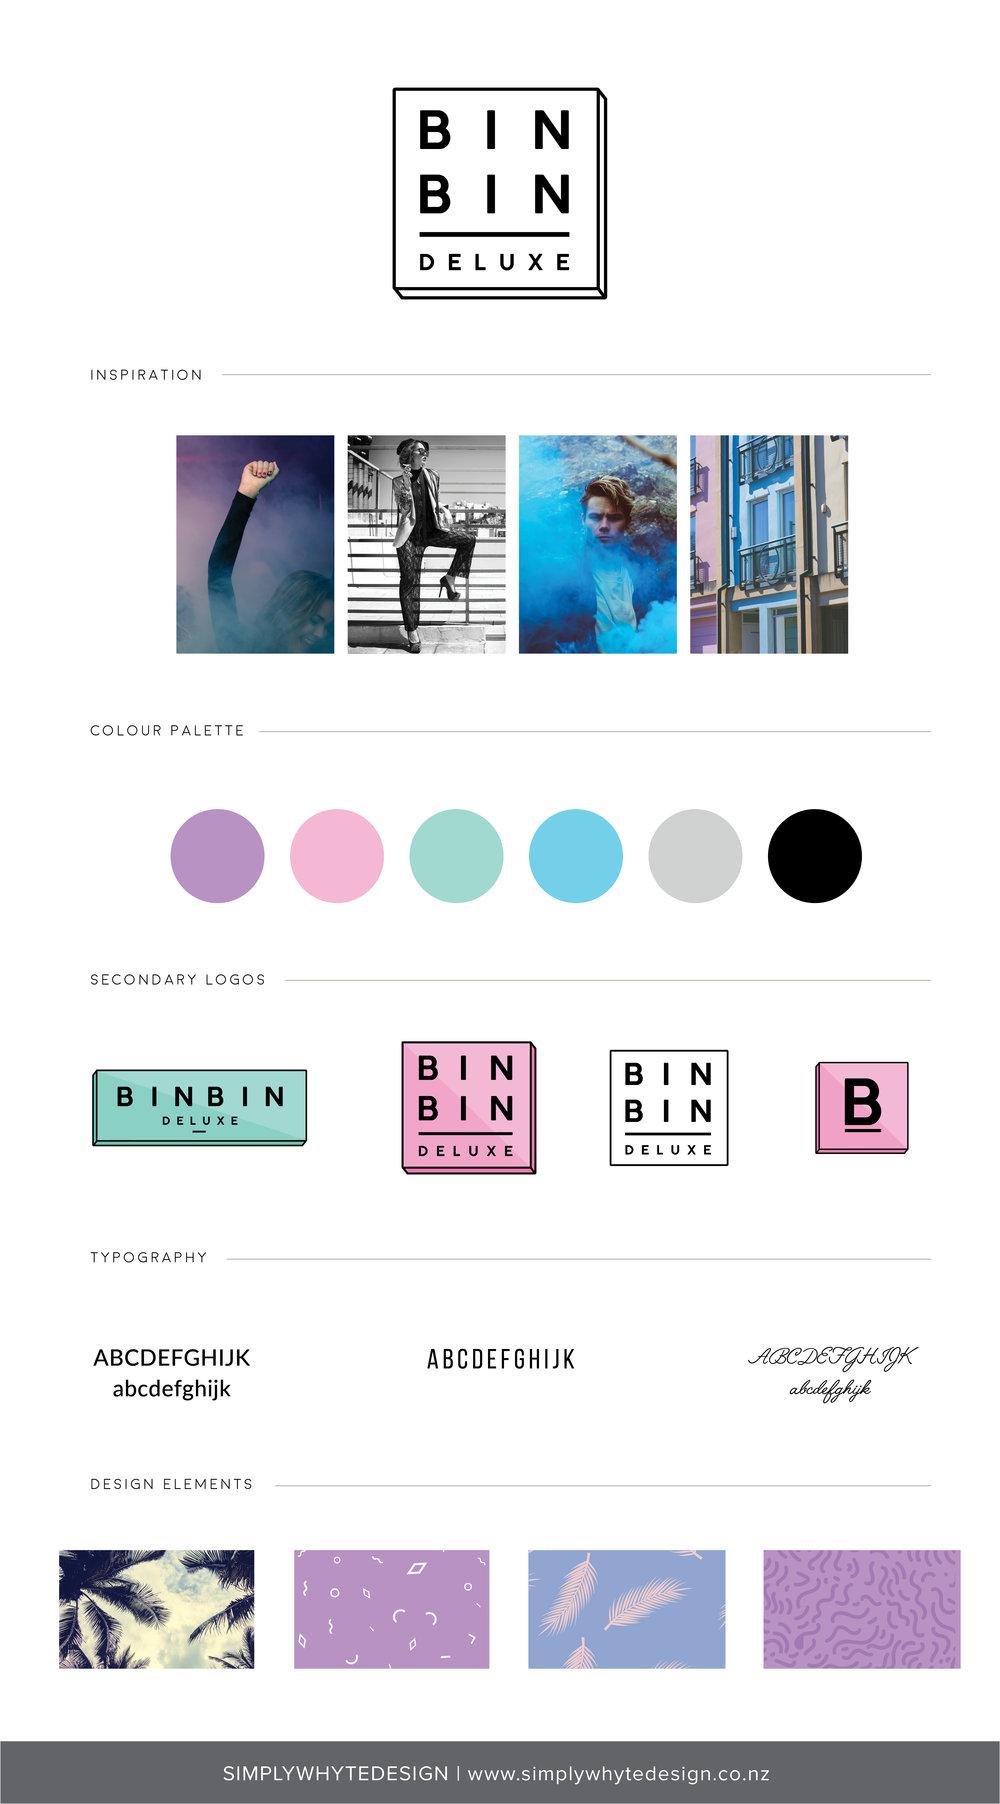 Bin Bin Deluxe - Simply Whyte Design | Auckland Brand Web Design